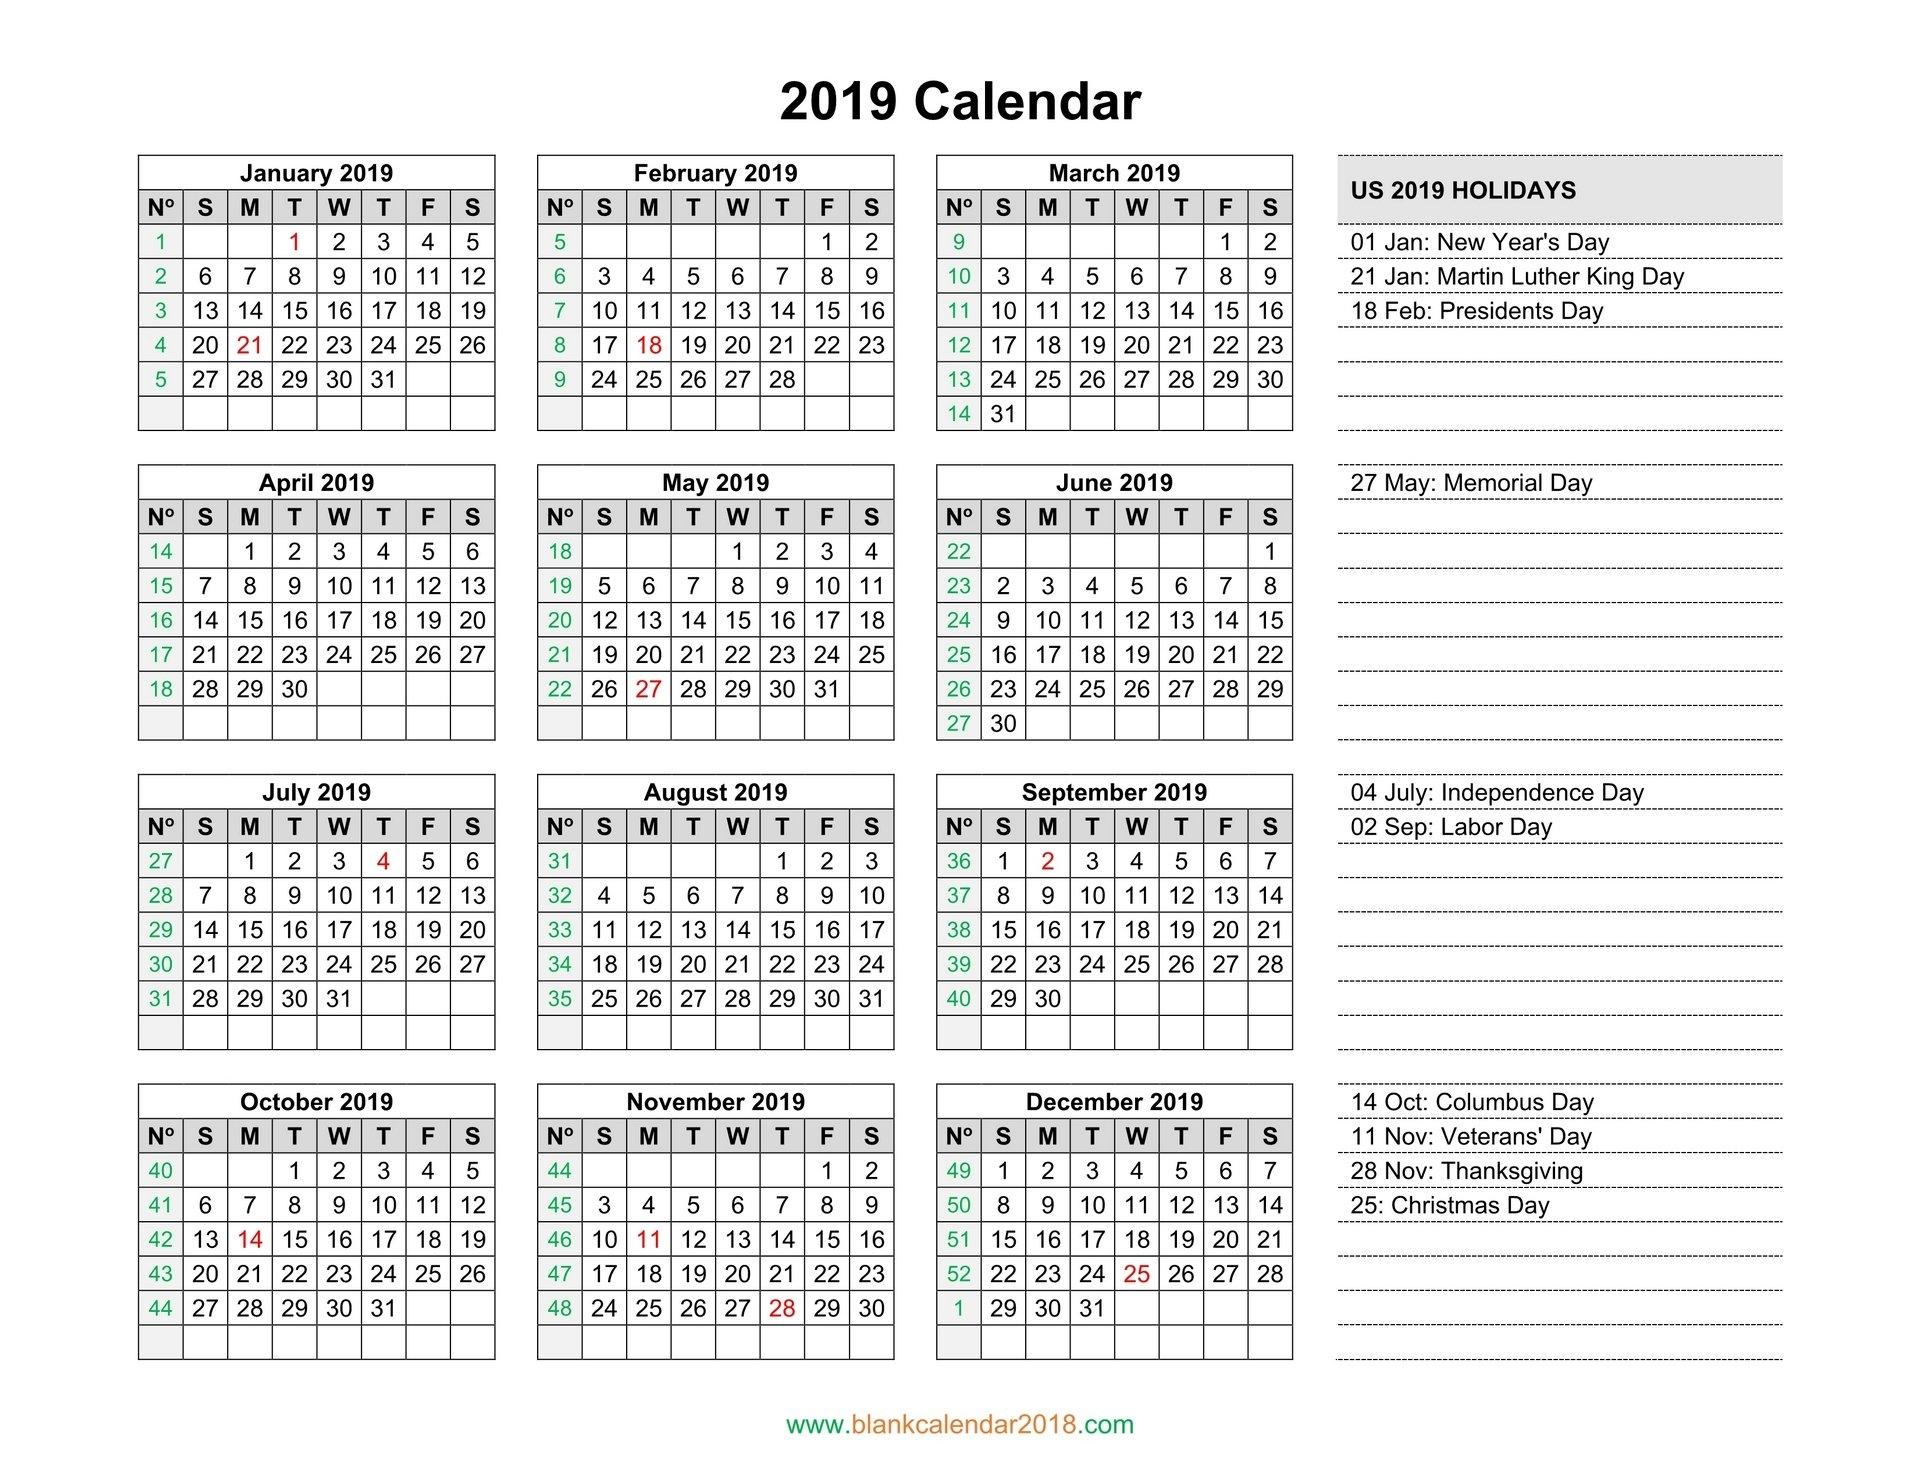 Blank Calendar 2019 Calendar 2019 Empty